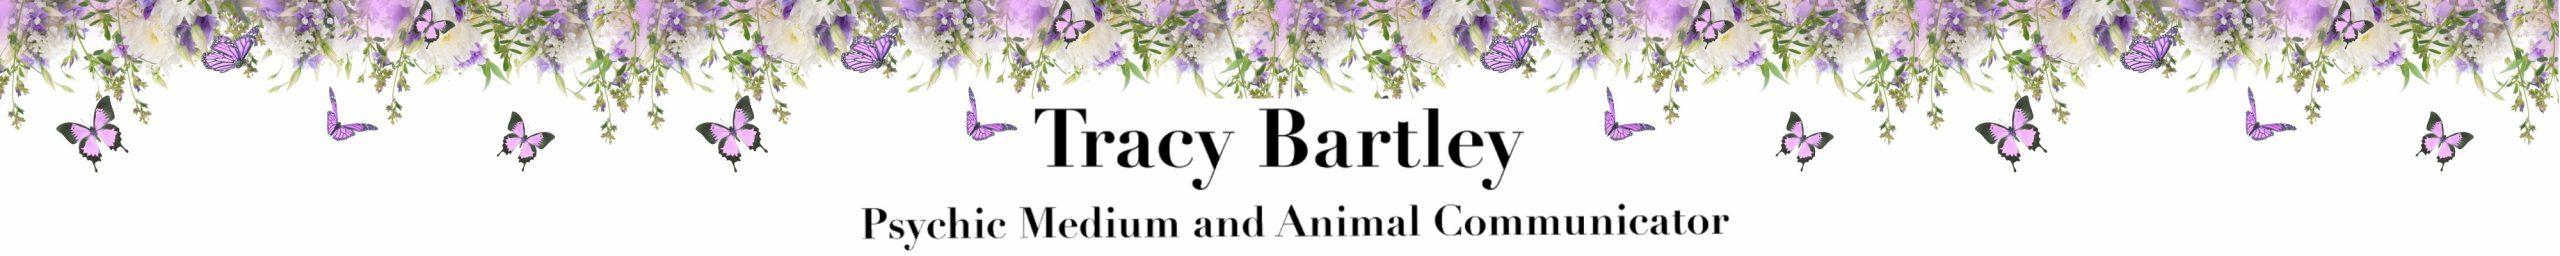 Tracy Bartley